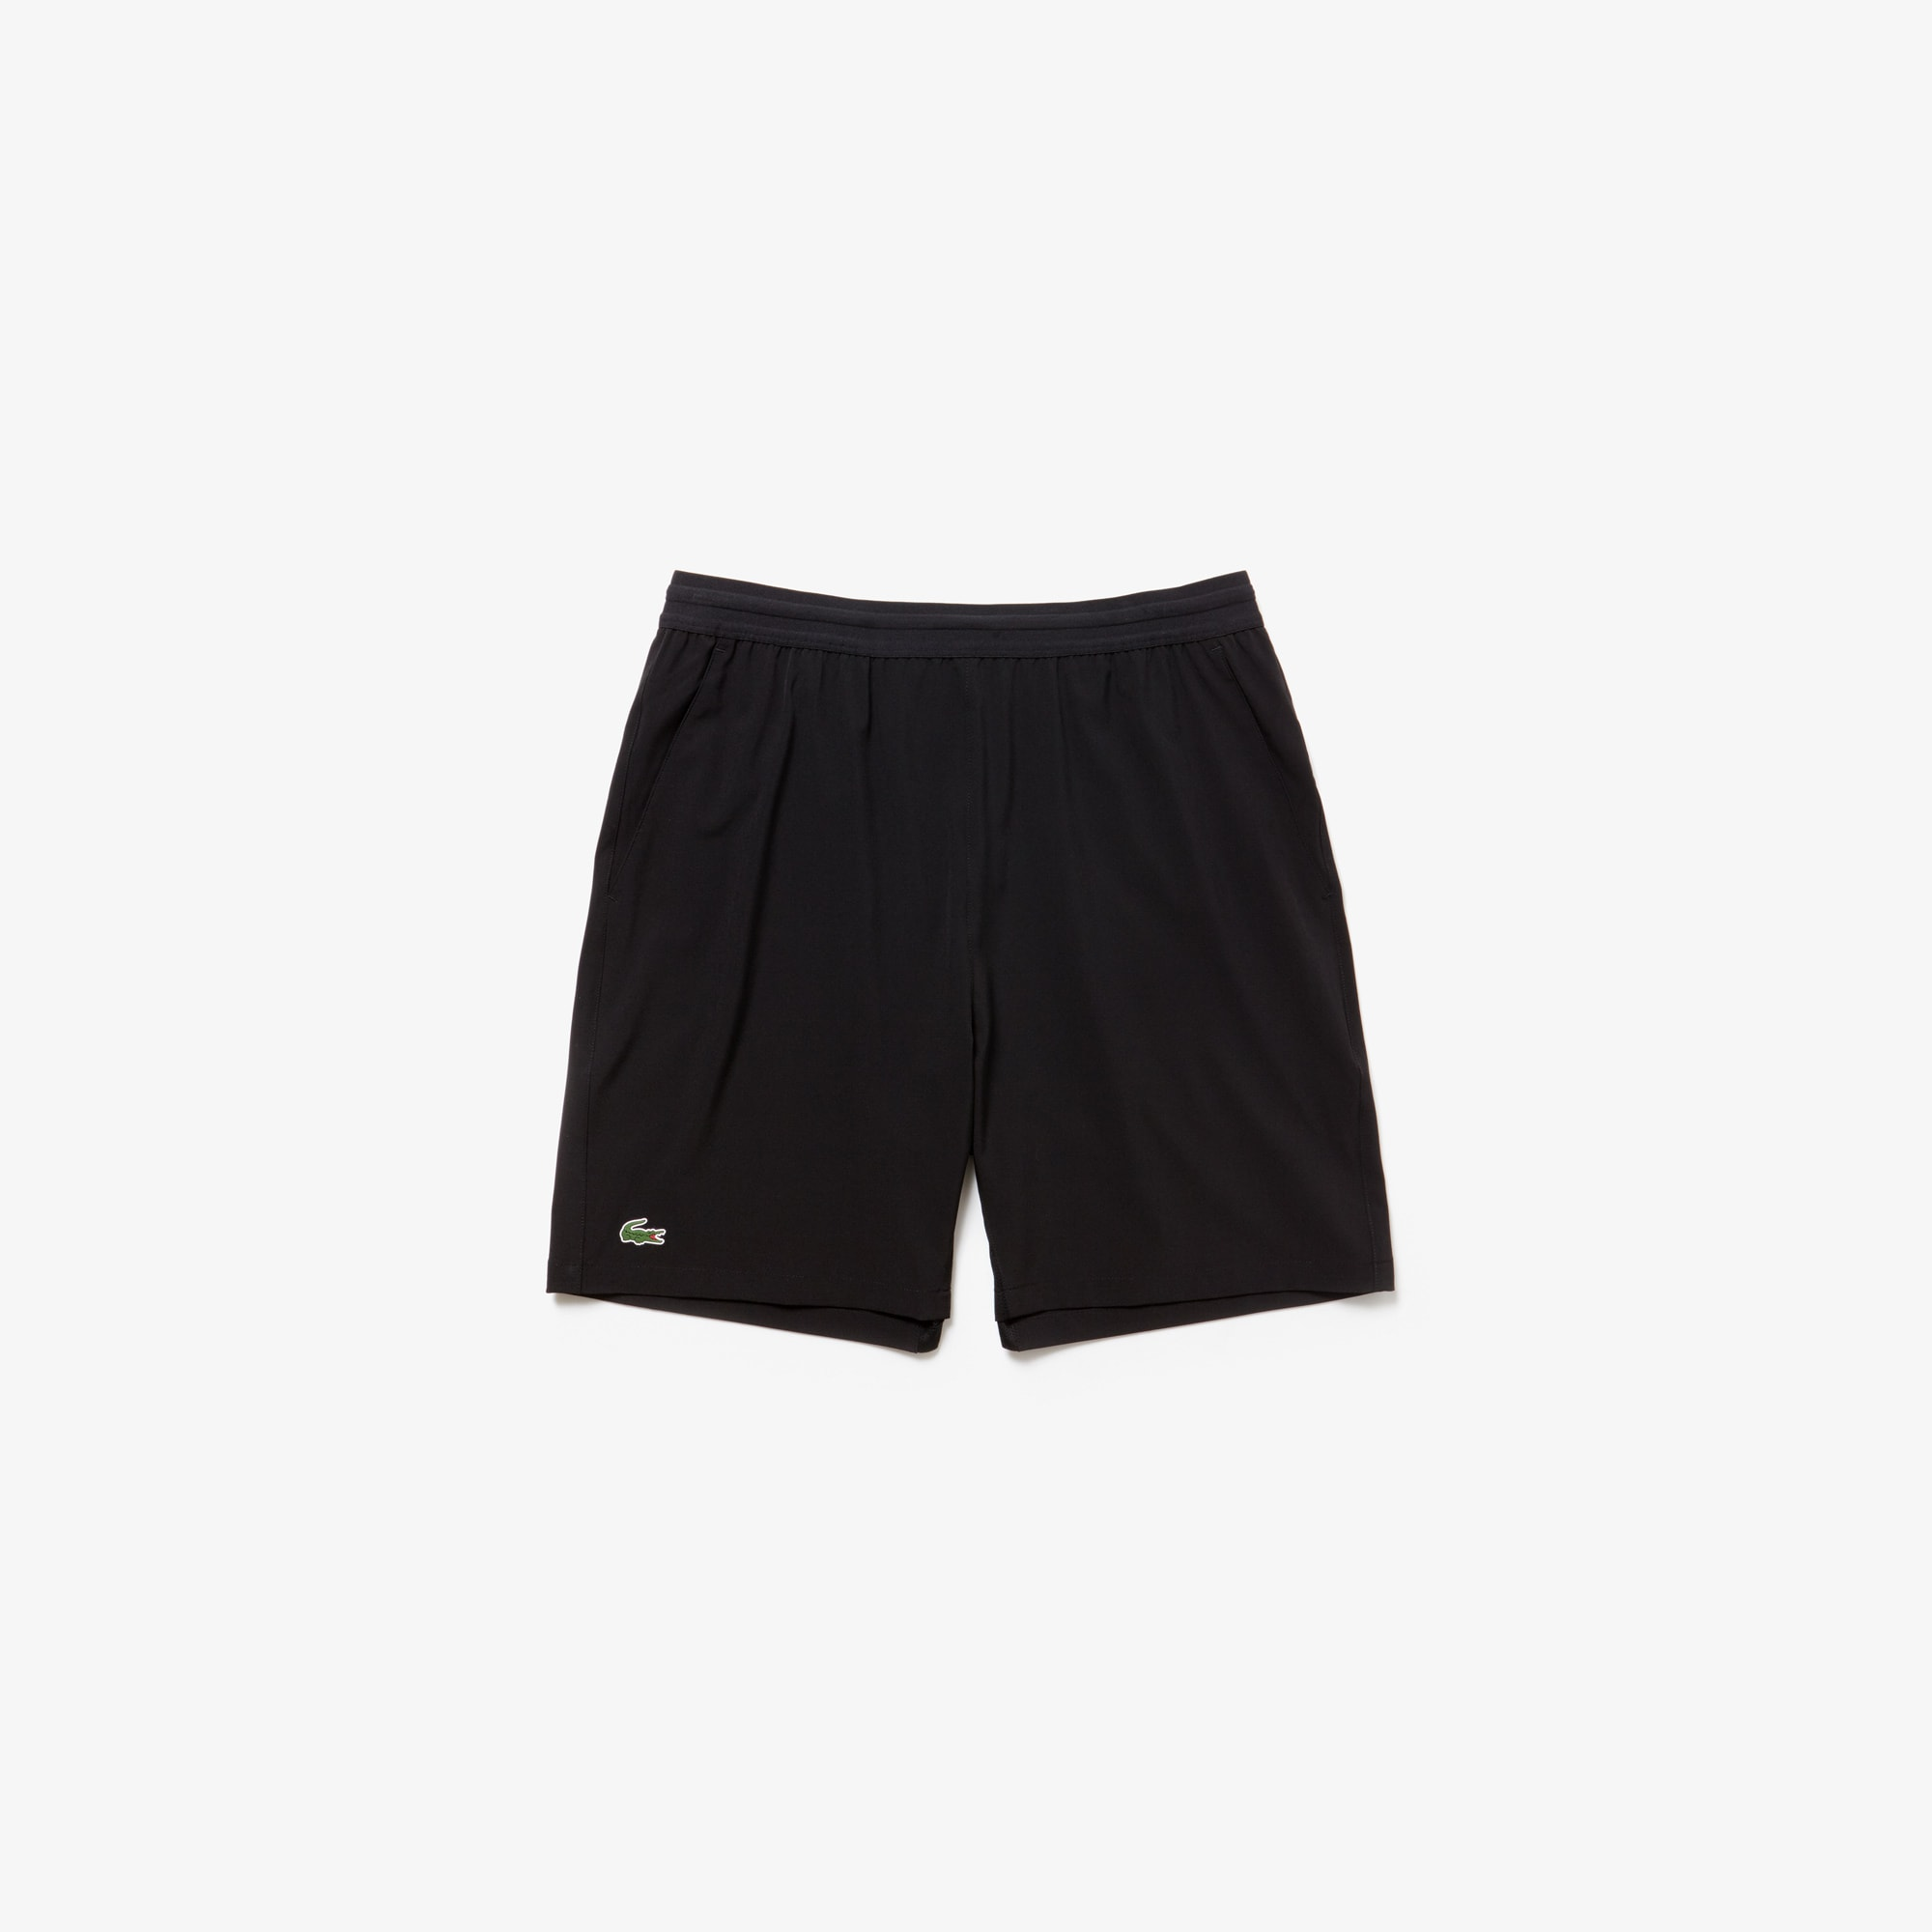 Men's  SPORT Tennis Stretch Shorts